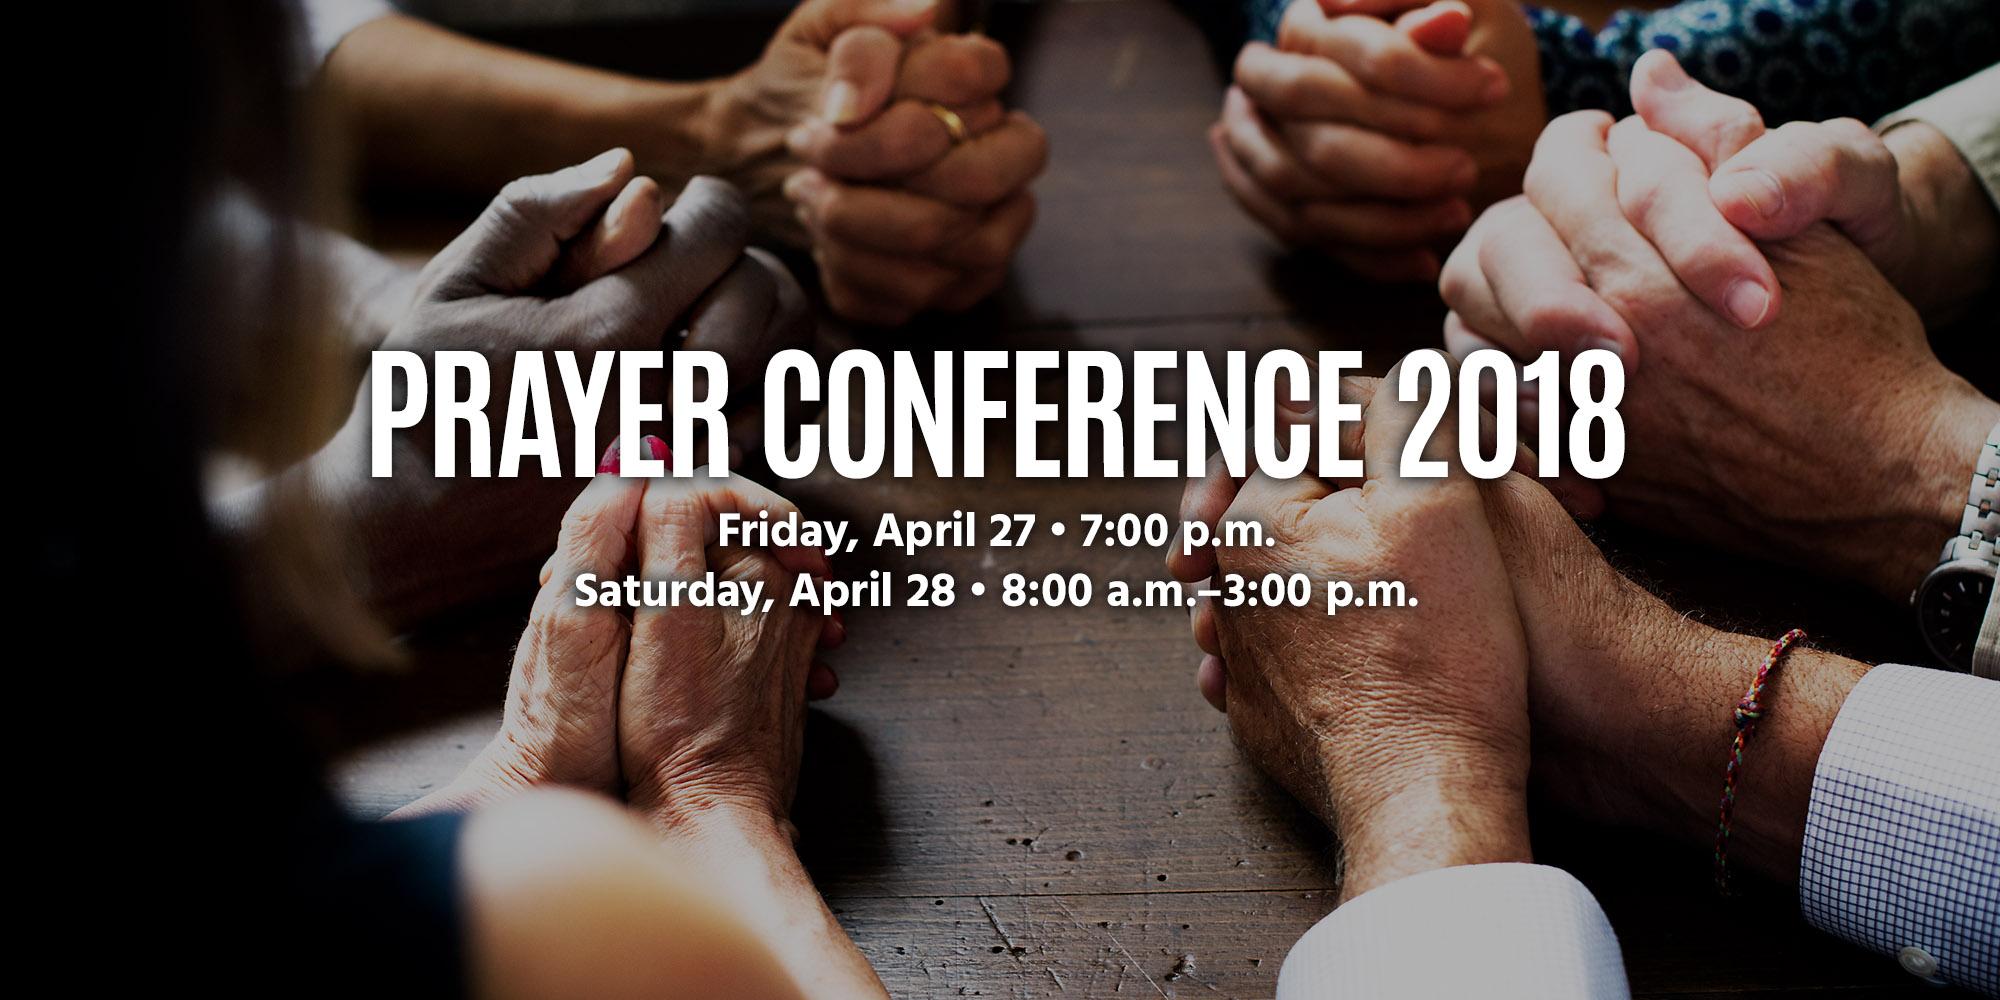 Prayer Conference 2018